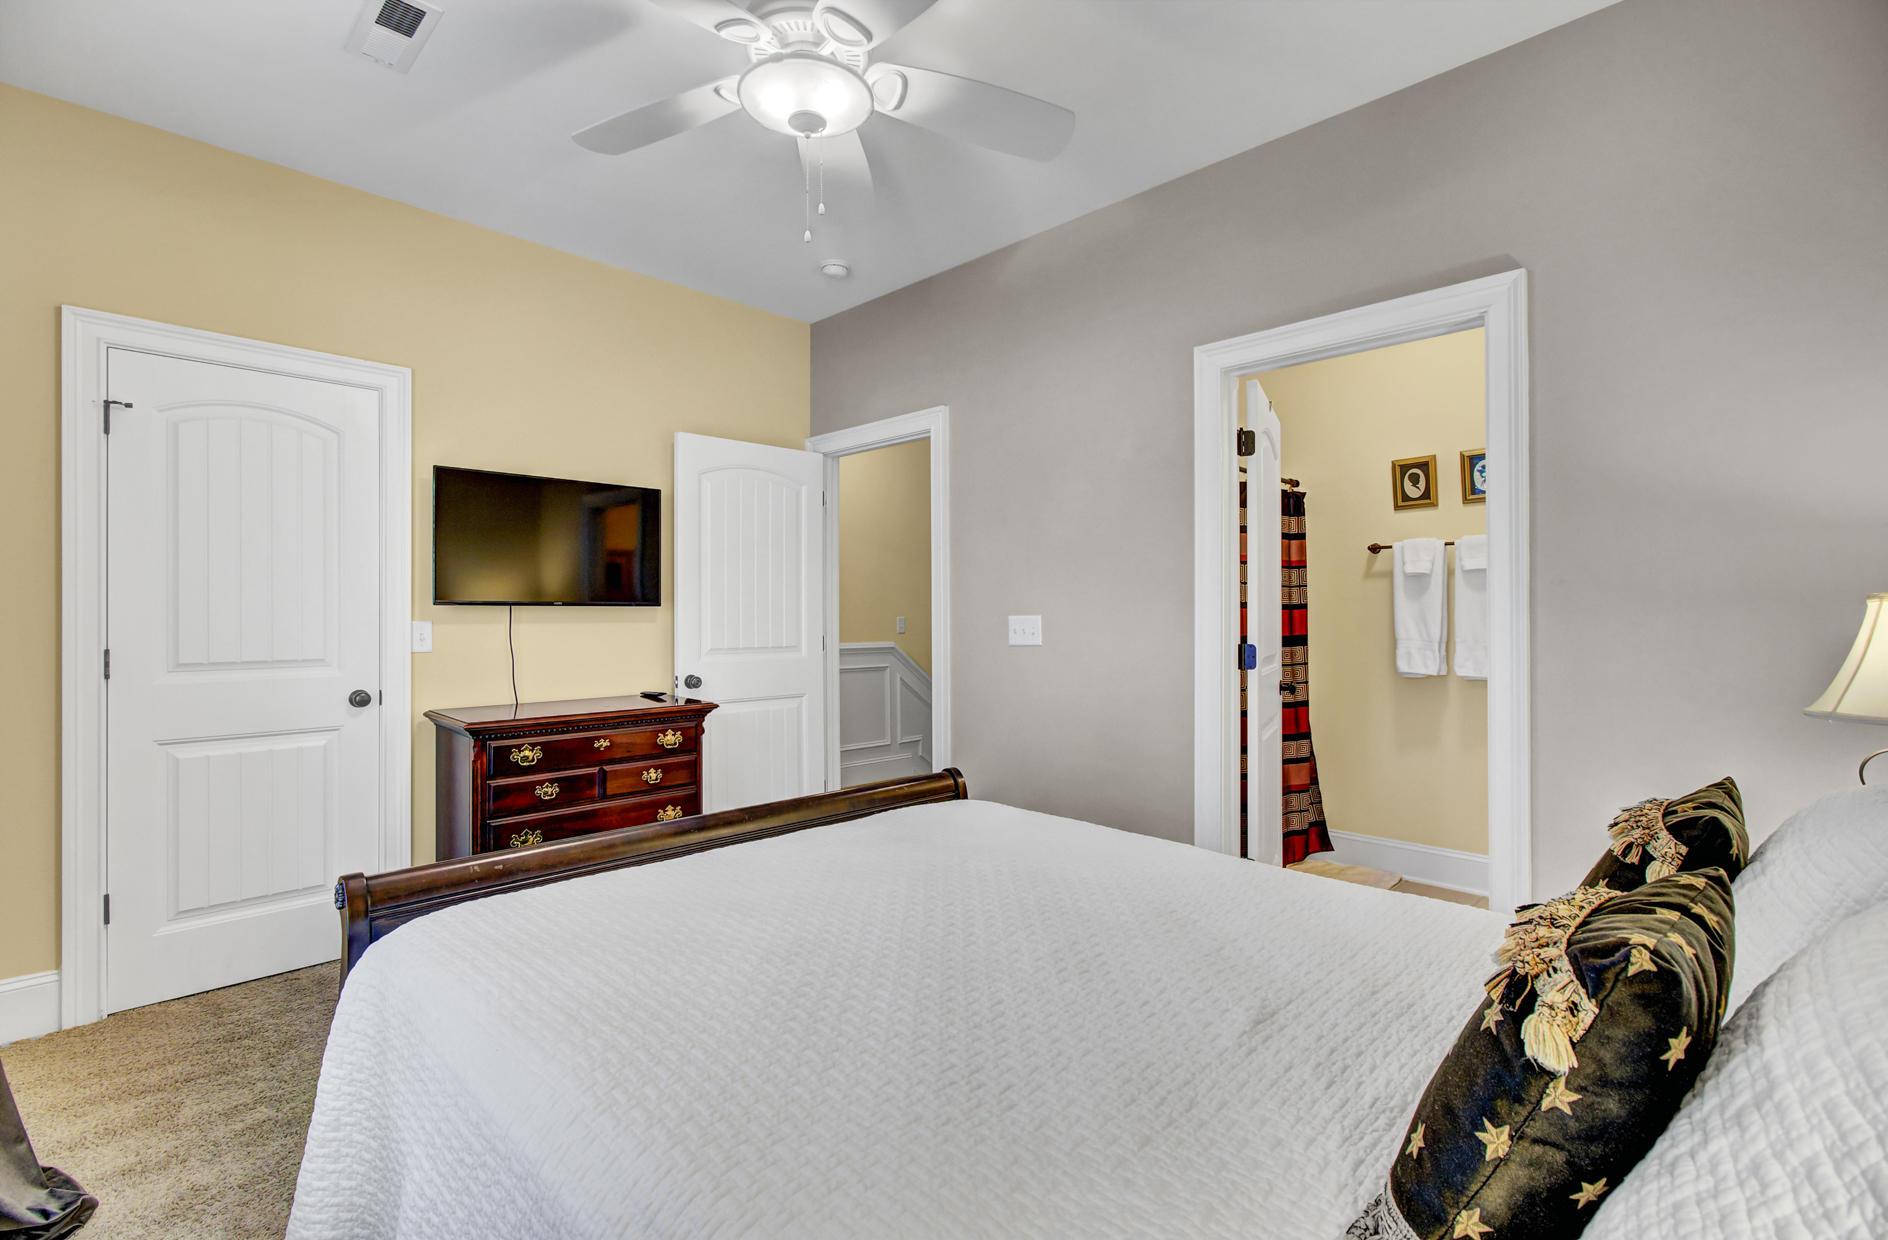 Carol Oaks Town Homes Homes For Sale - 2956 Emma, Mount Pleasant, SC - 5